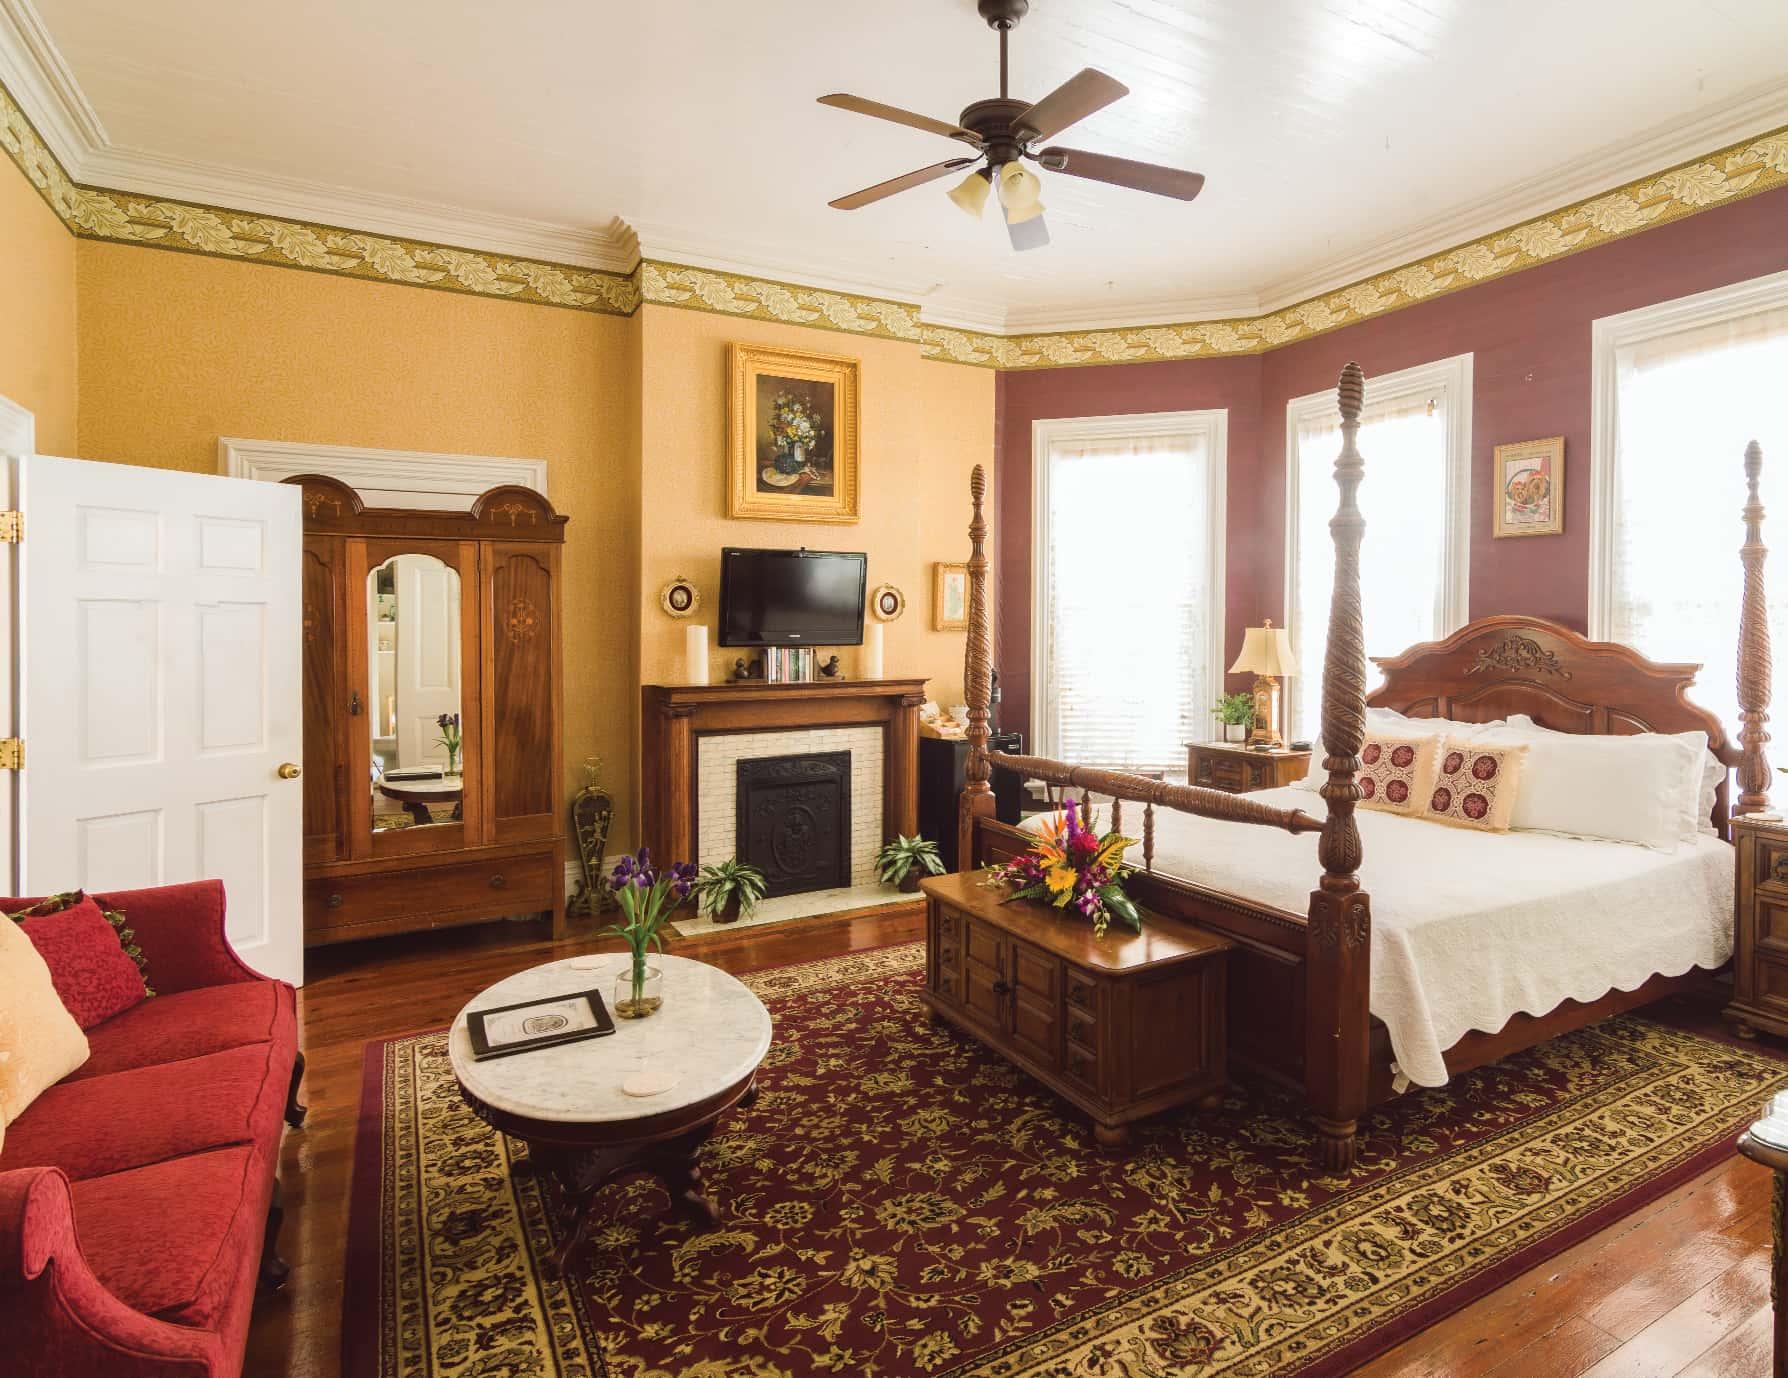 Eugene Studio Suite at our Historic Key West, Florida Inn